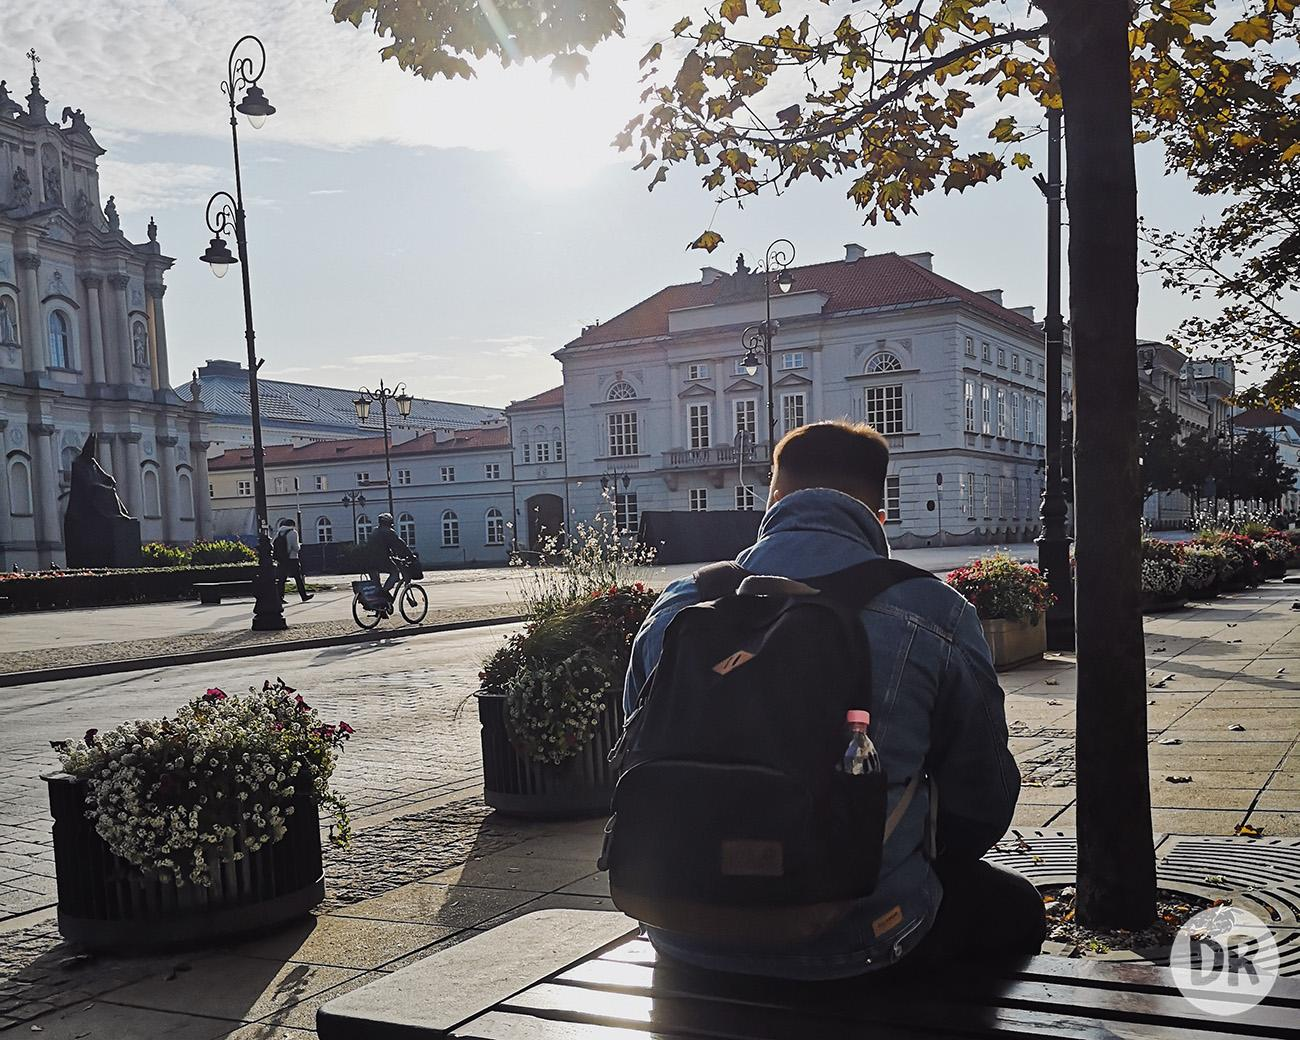 рюкзак вместо чемодана в путешествиях